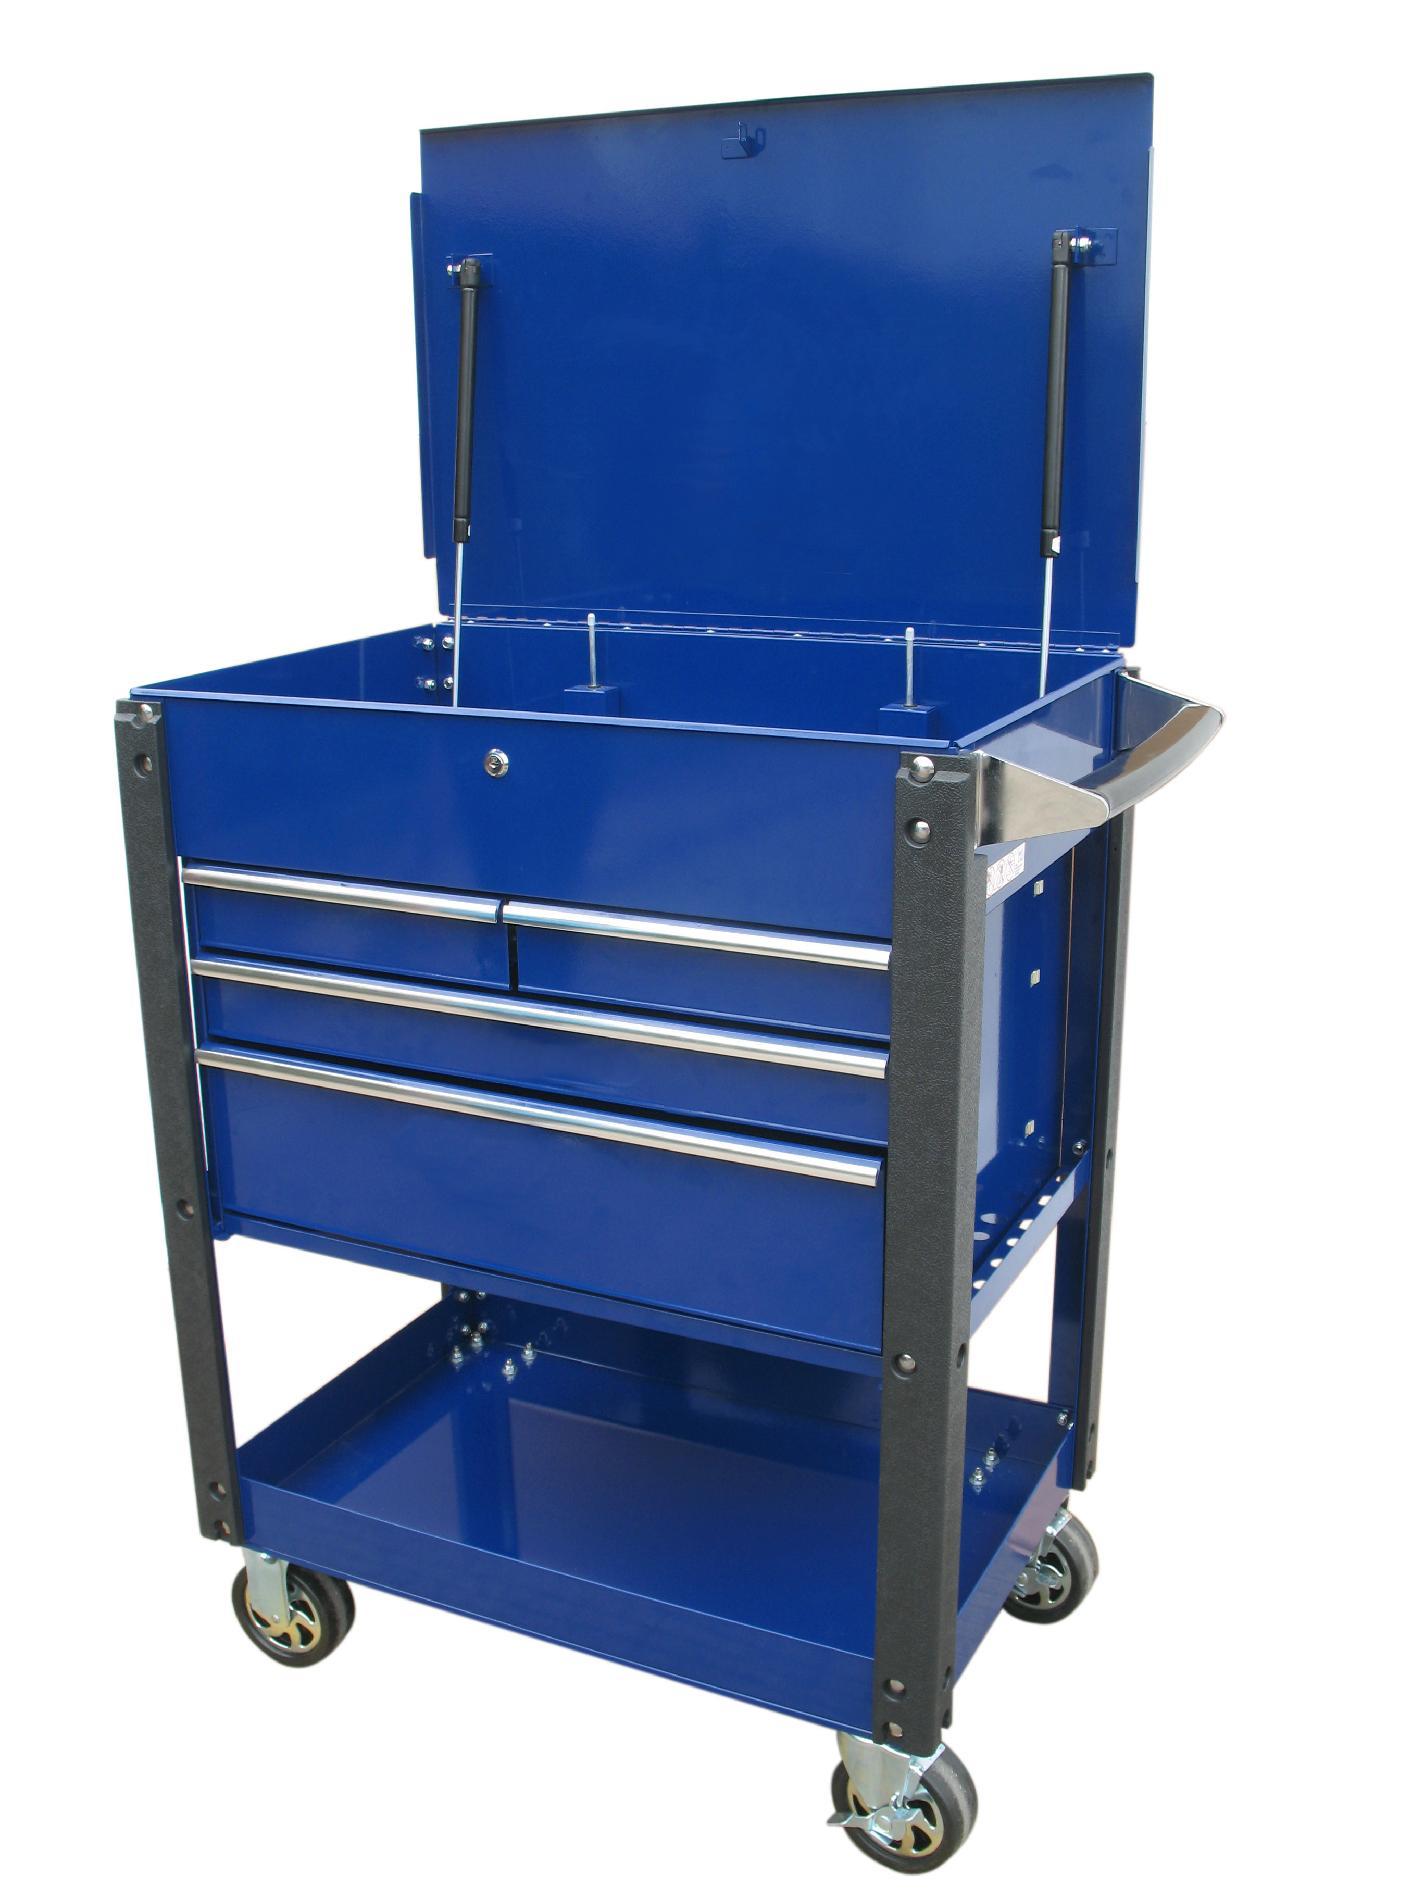 "International 30"" 4-Dwr. Automotive Heavy Duty Industrial Cart. PLUS FREE SHIPPING PartNumber: 00917313000P KsnValue: 6089723 MfgPartNumber: UCM-3004BU"